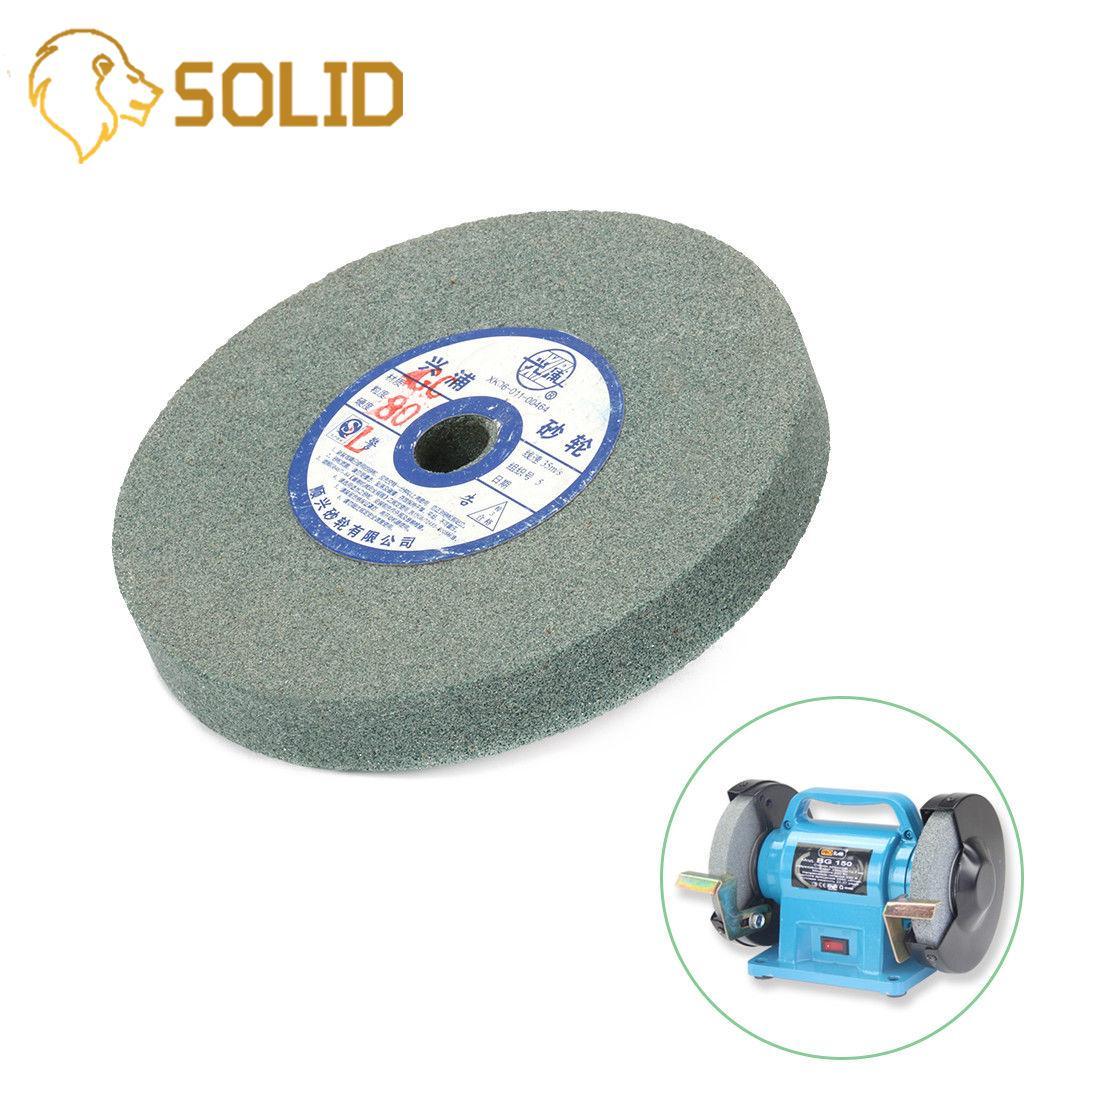 "5"" Ceramic Grinding Wheel Resistant Disc 125mmx12.7x16mm Abrasive Disc Polishing Metal Stone Wheel For Bench Grinders 80#"